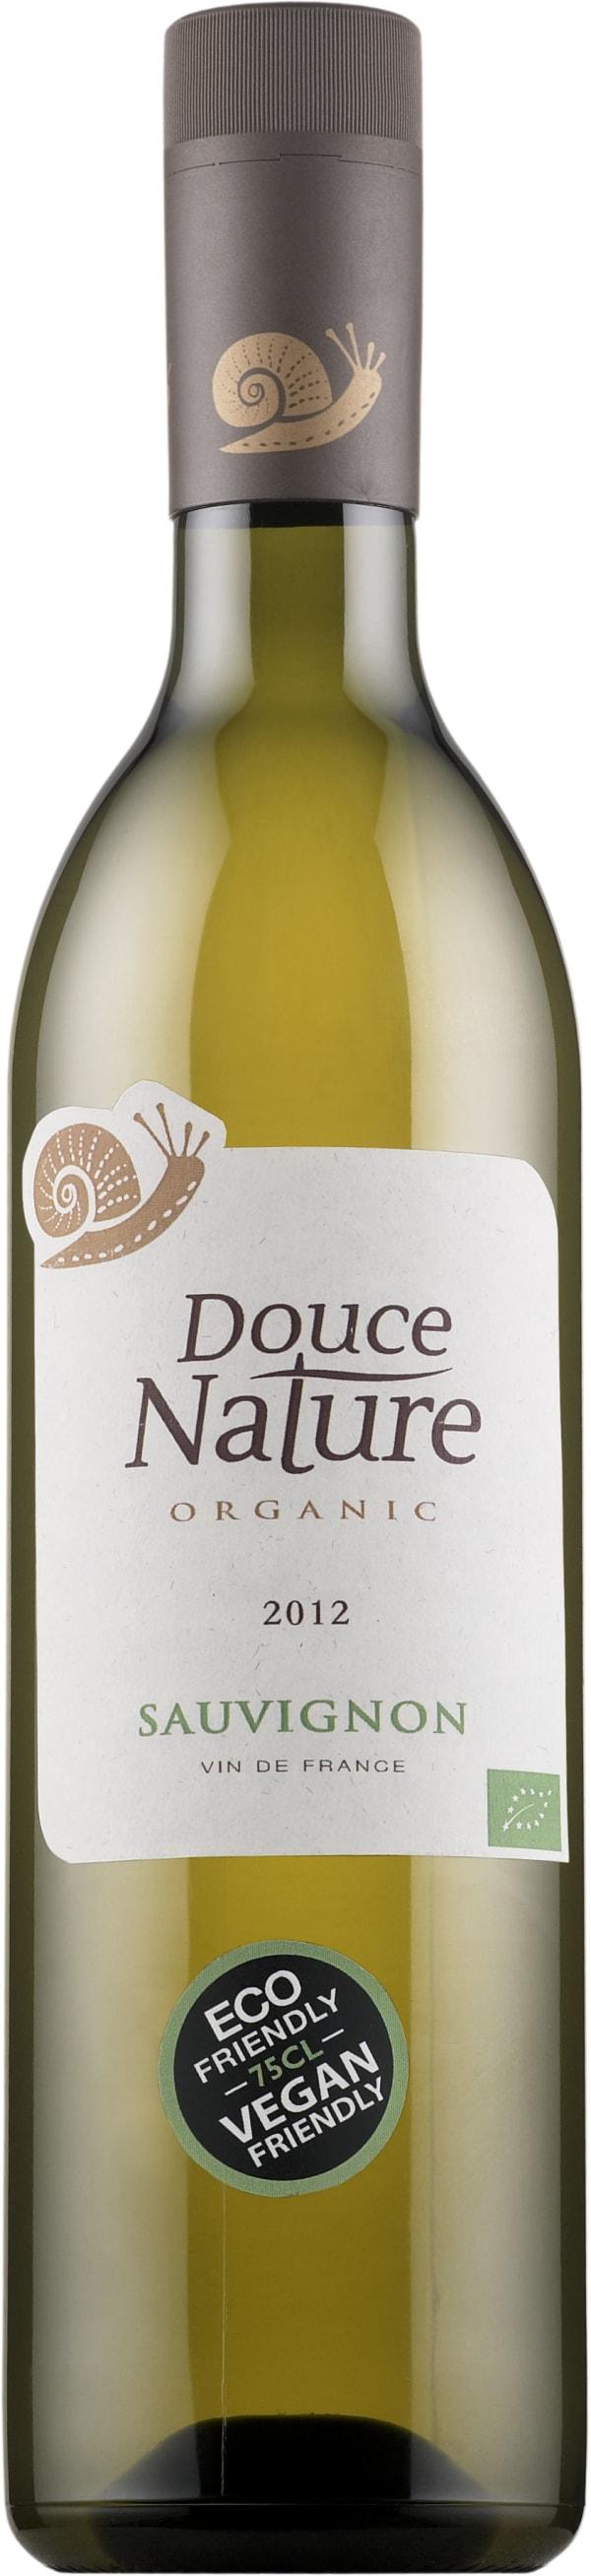 Douce Nature Organic Sauvignon Blanc 2015 plastic bottle